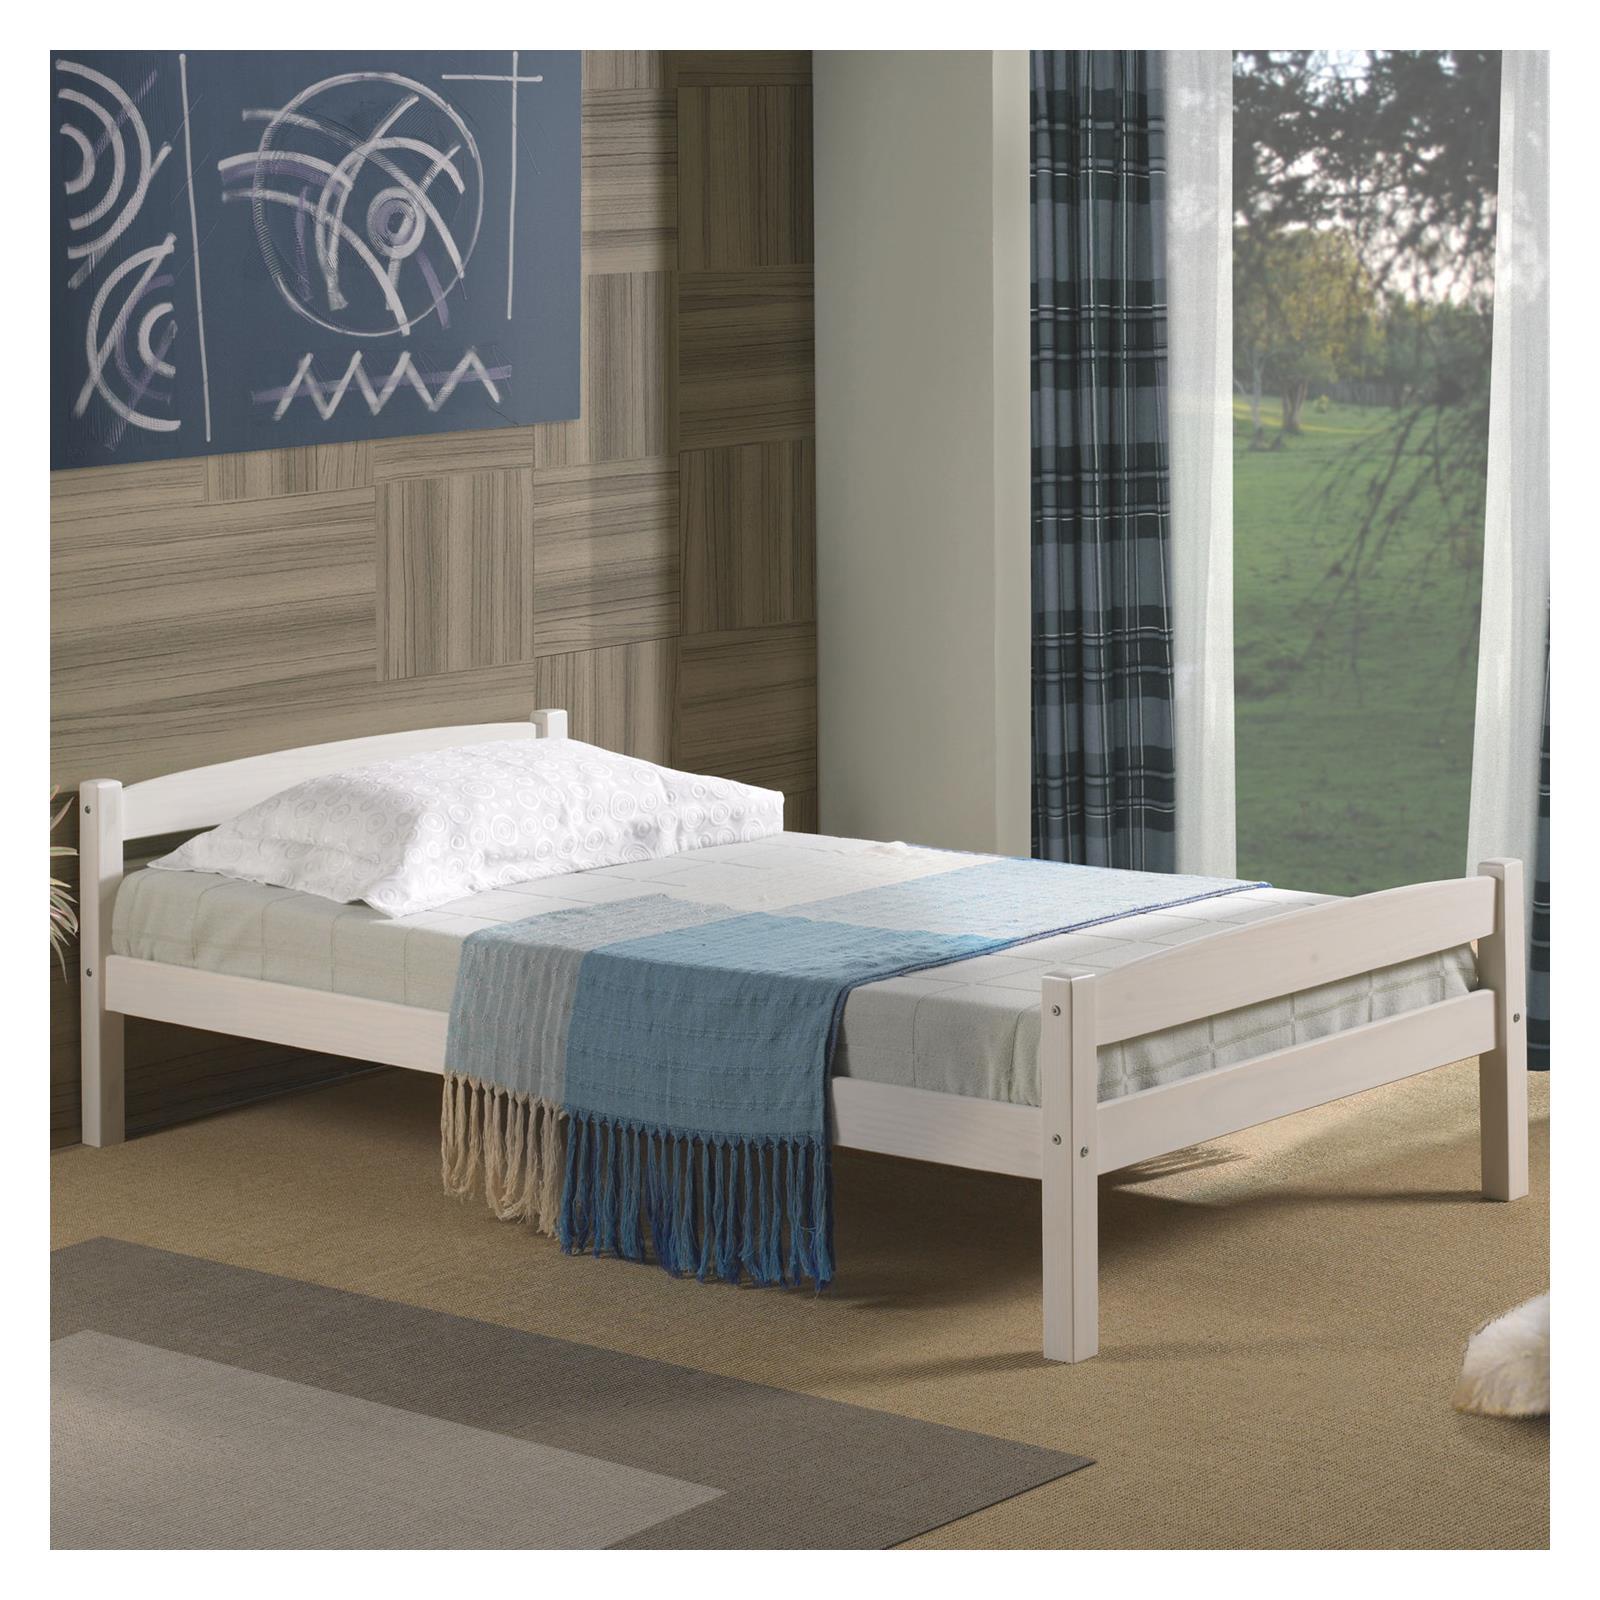 einzelbett felix 90x190 cm kiefer wei mobilia24. Black Bedroom Furniture Sets. Home Design Ideas